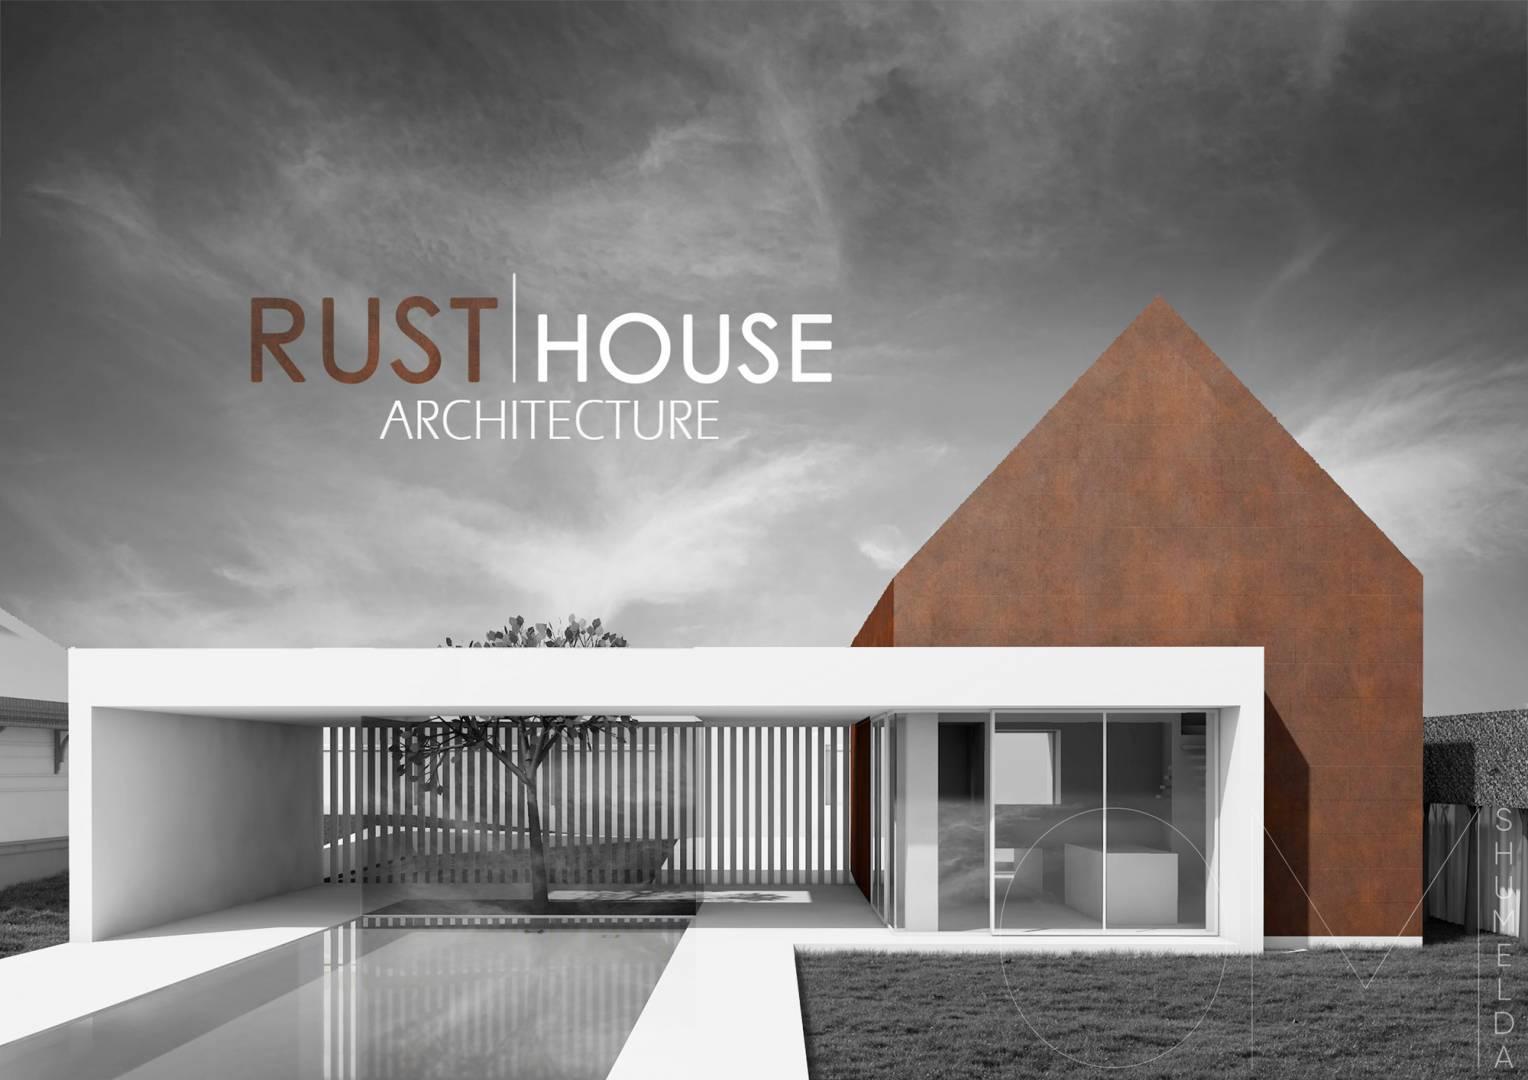 RUST HOUSE